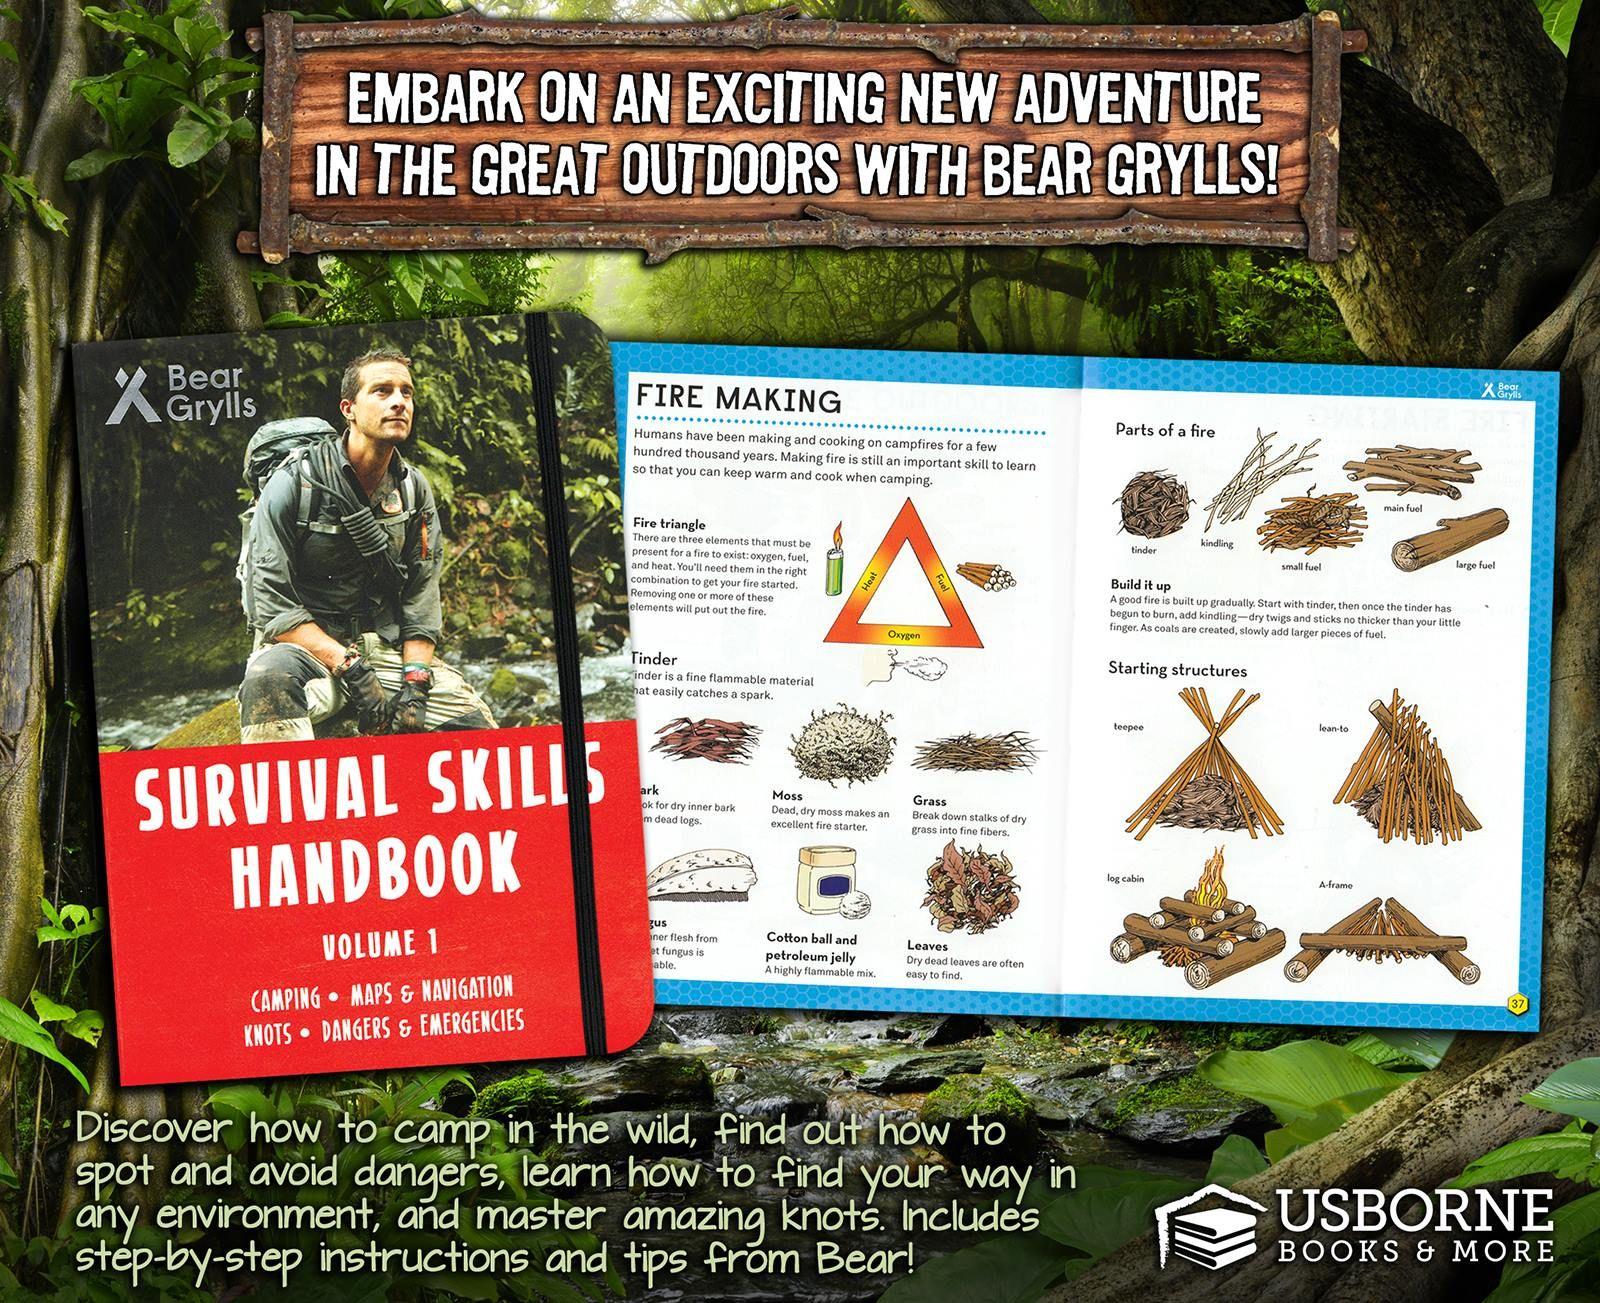 Dangers and Emergencies Survival Skills Handbook